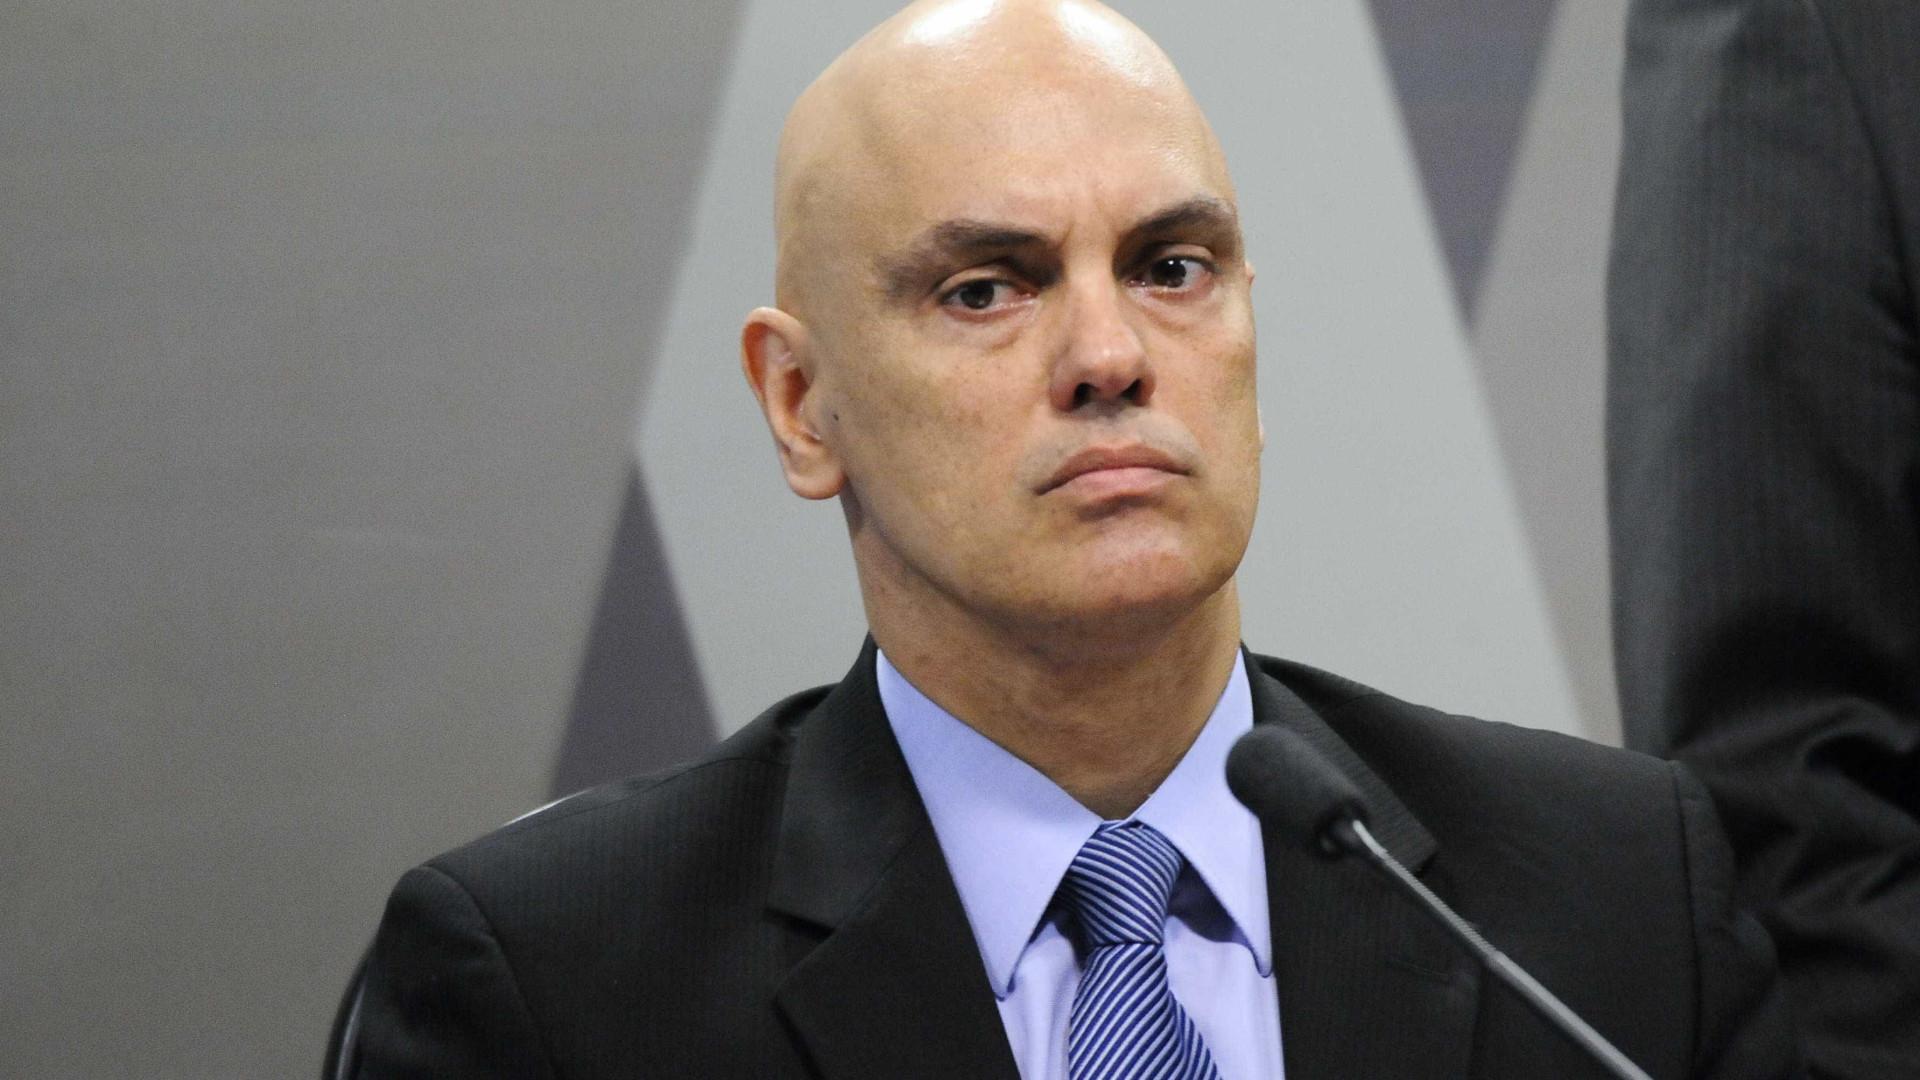 Alexandre suspende portaria de Bolsonaro que dificulta rastreio de armas